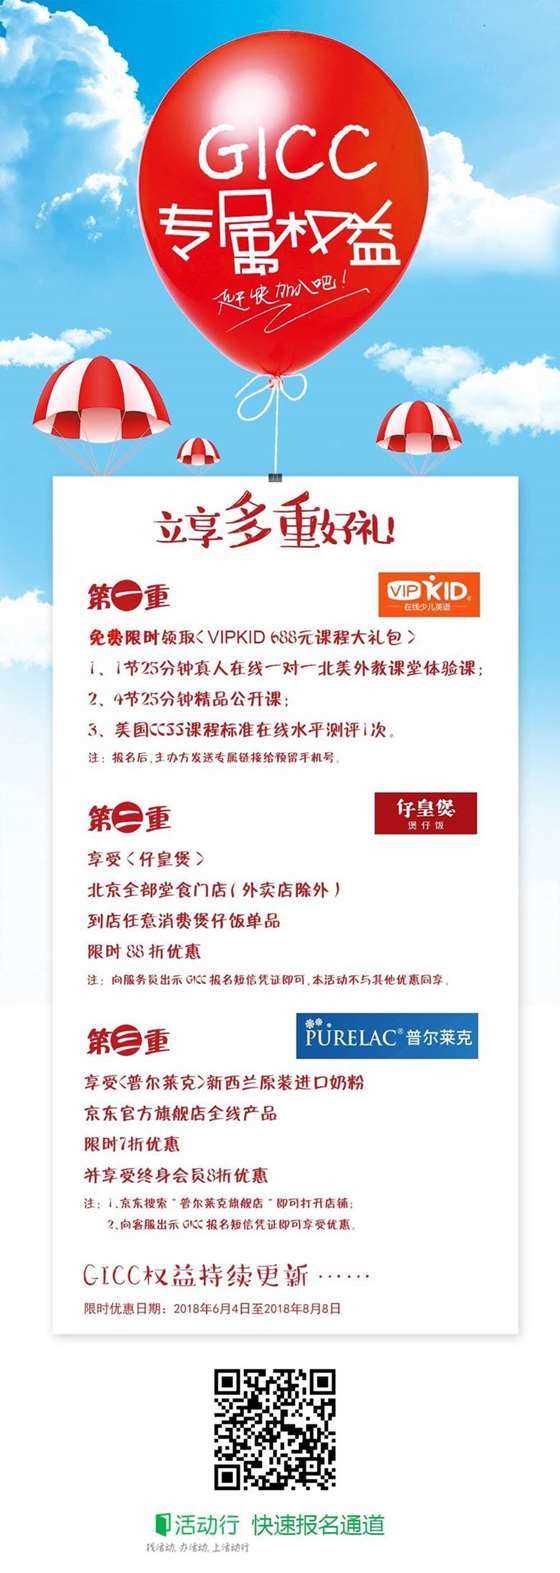 GICC权益海报-活动行.jpg